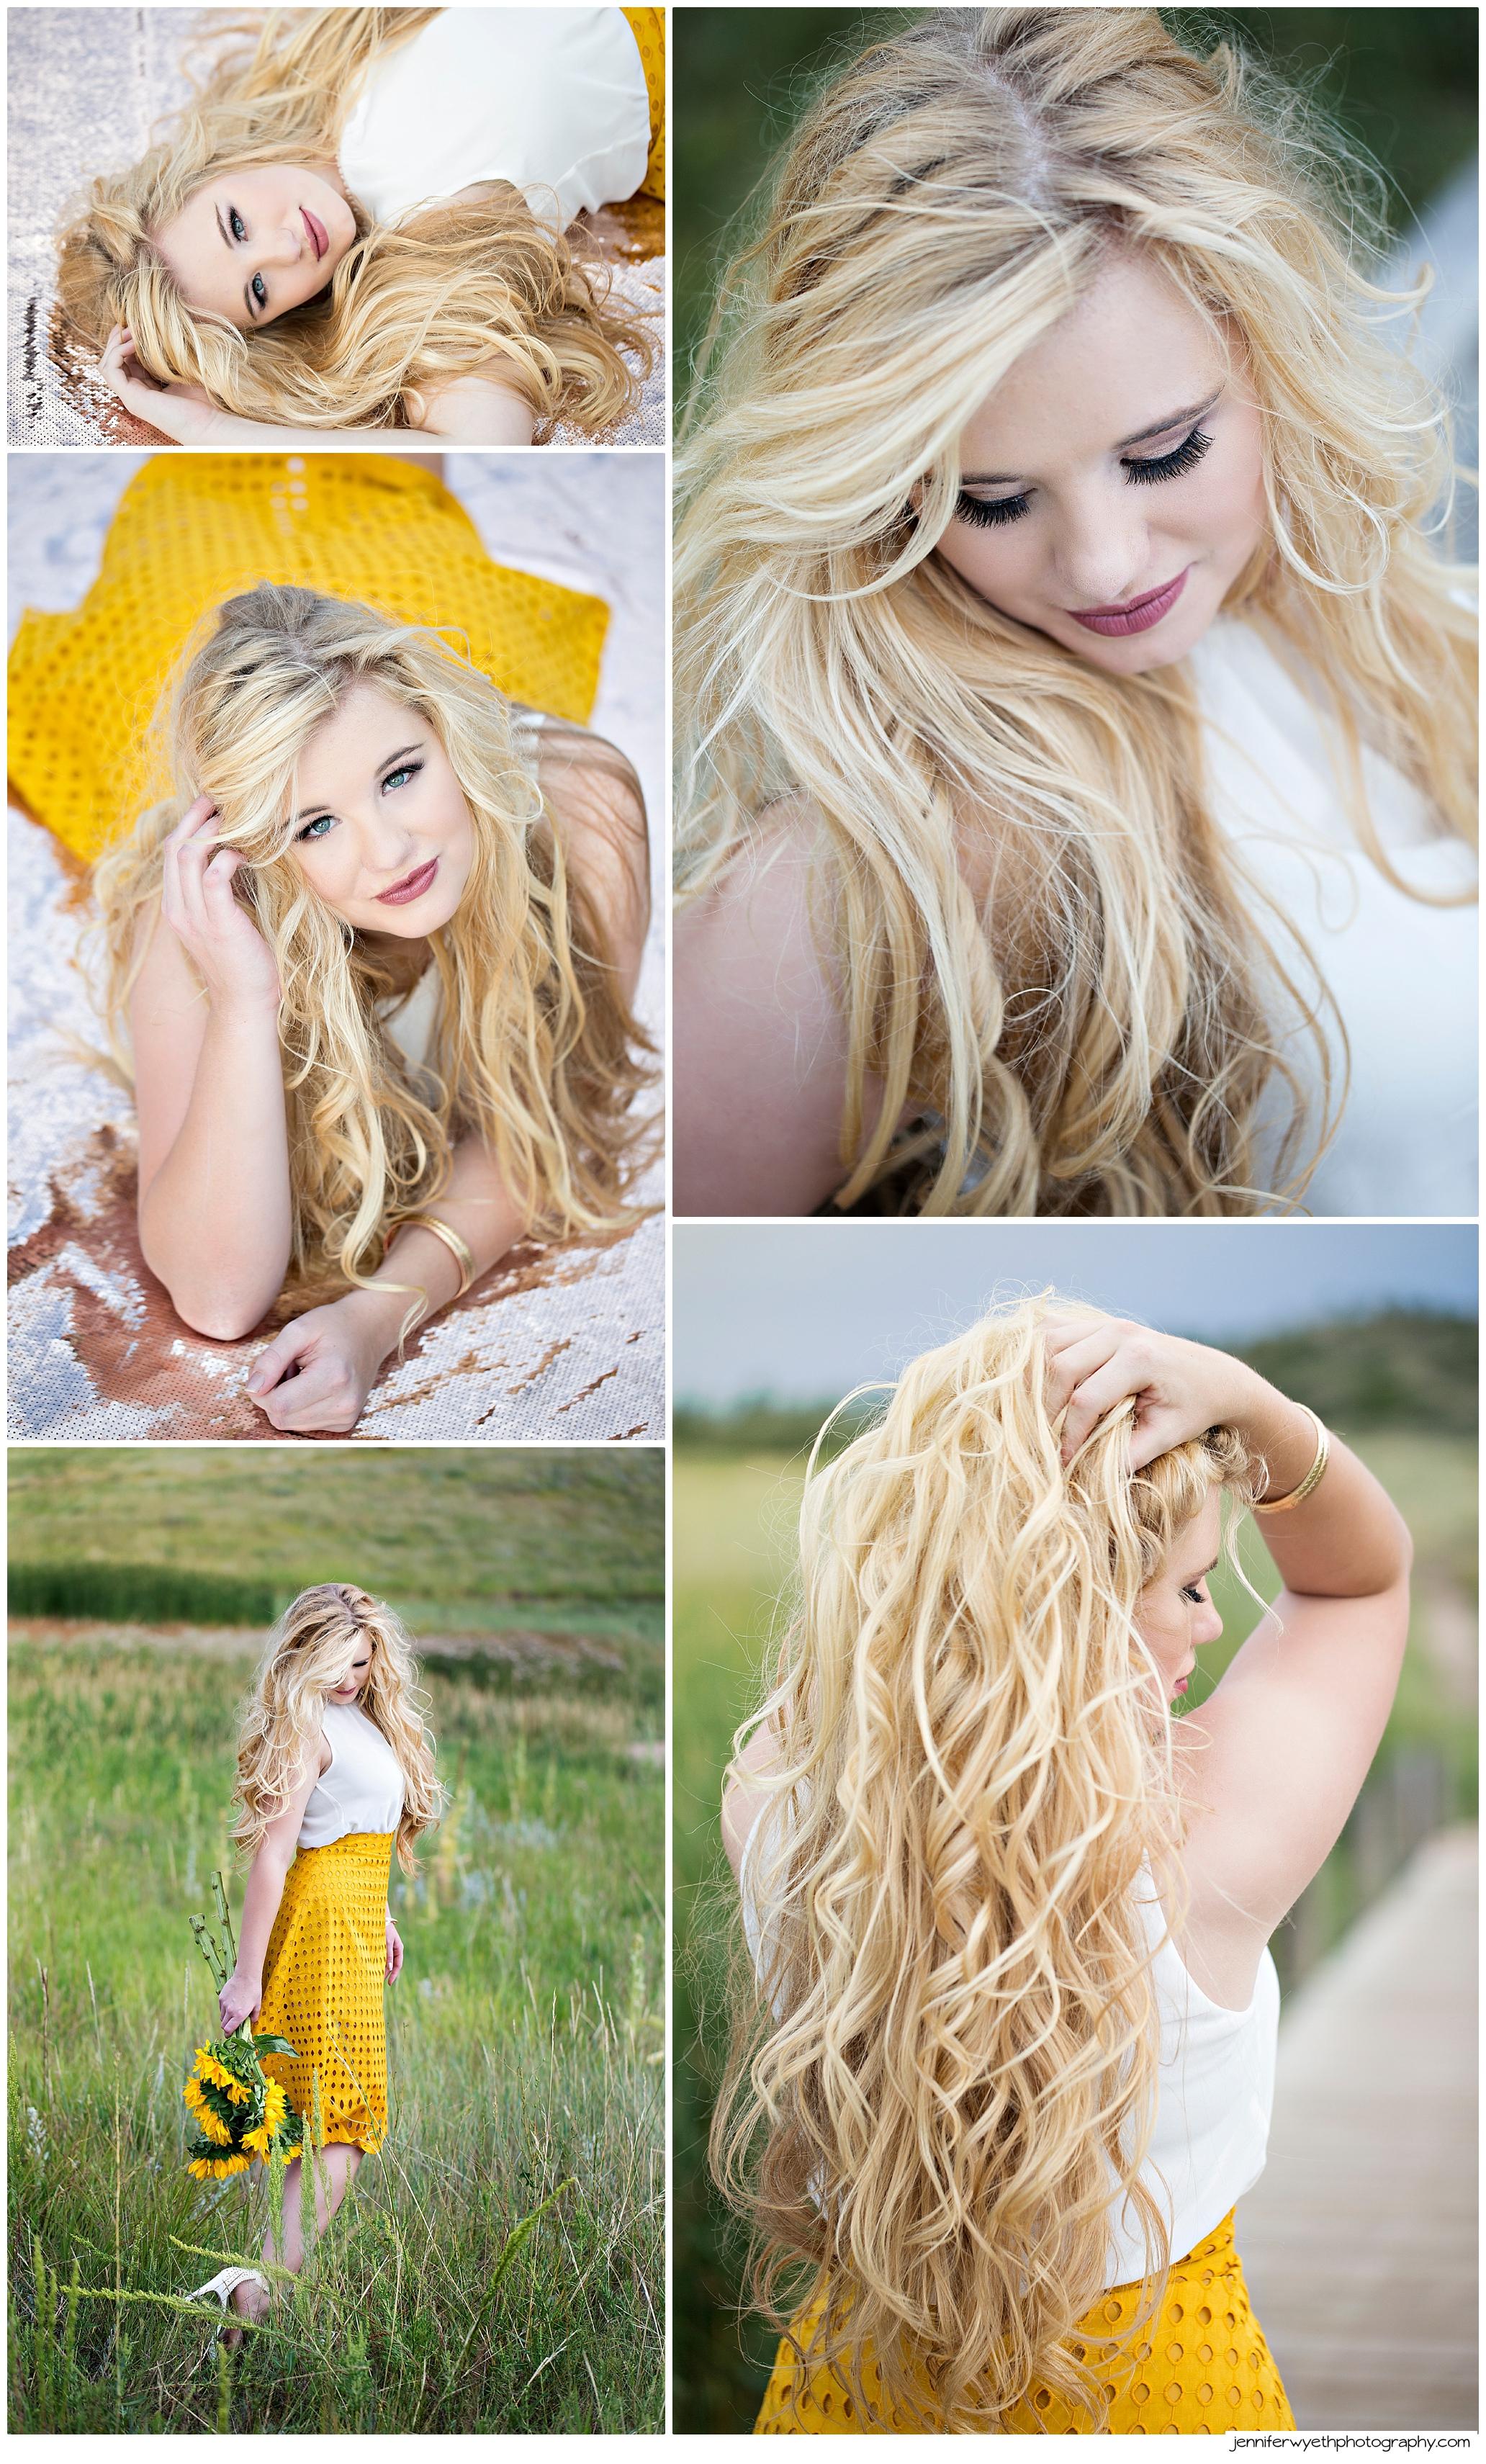 Jennifer-Wyeth-photography-senior-pictures-colorado-springs-photographer_0172.jpg